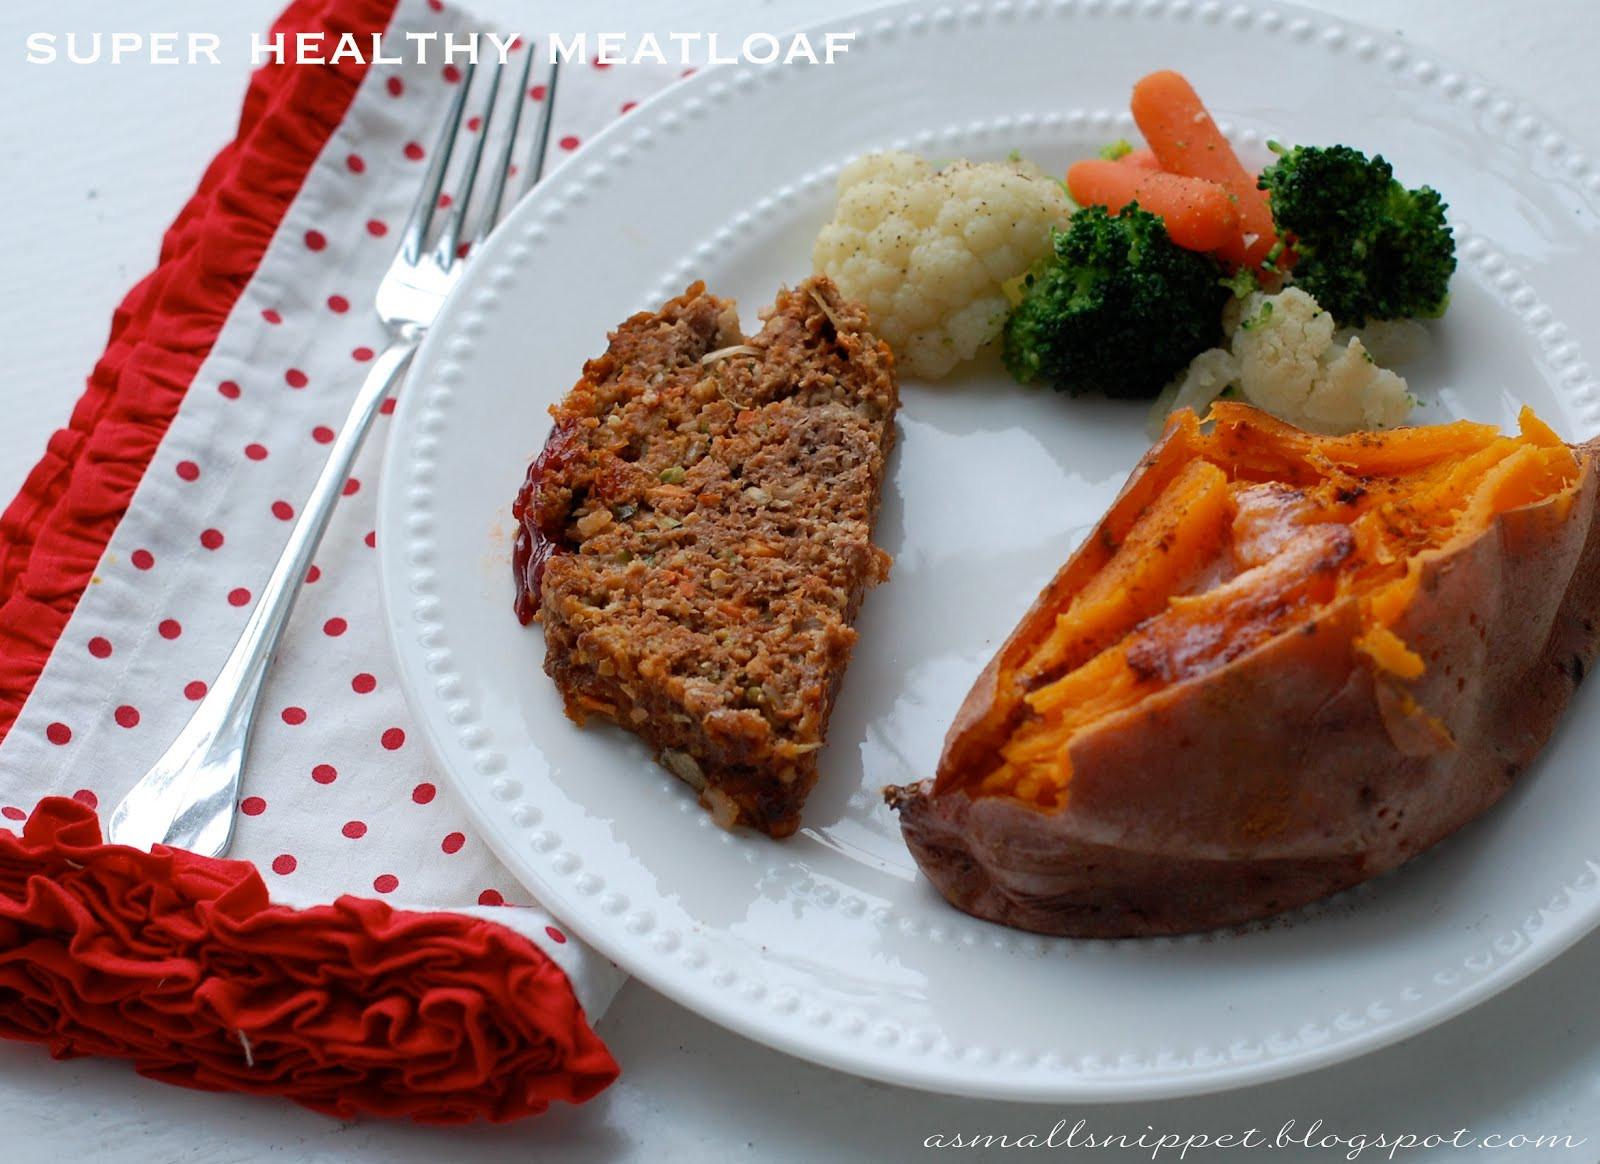 Is Meatloaf Healthy  Super Healthy Meatloaf Recipe